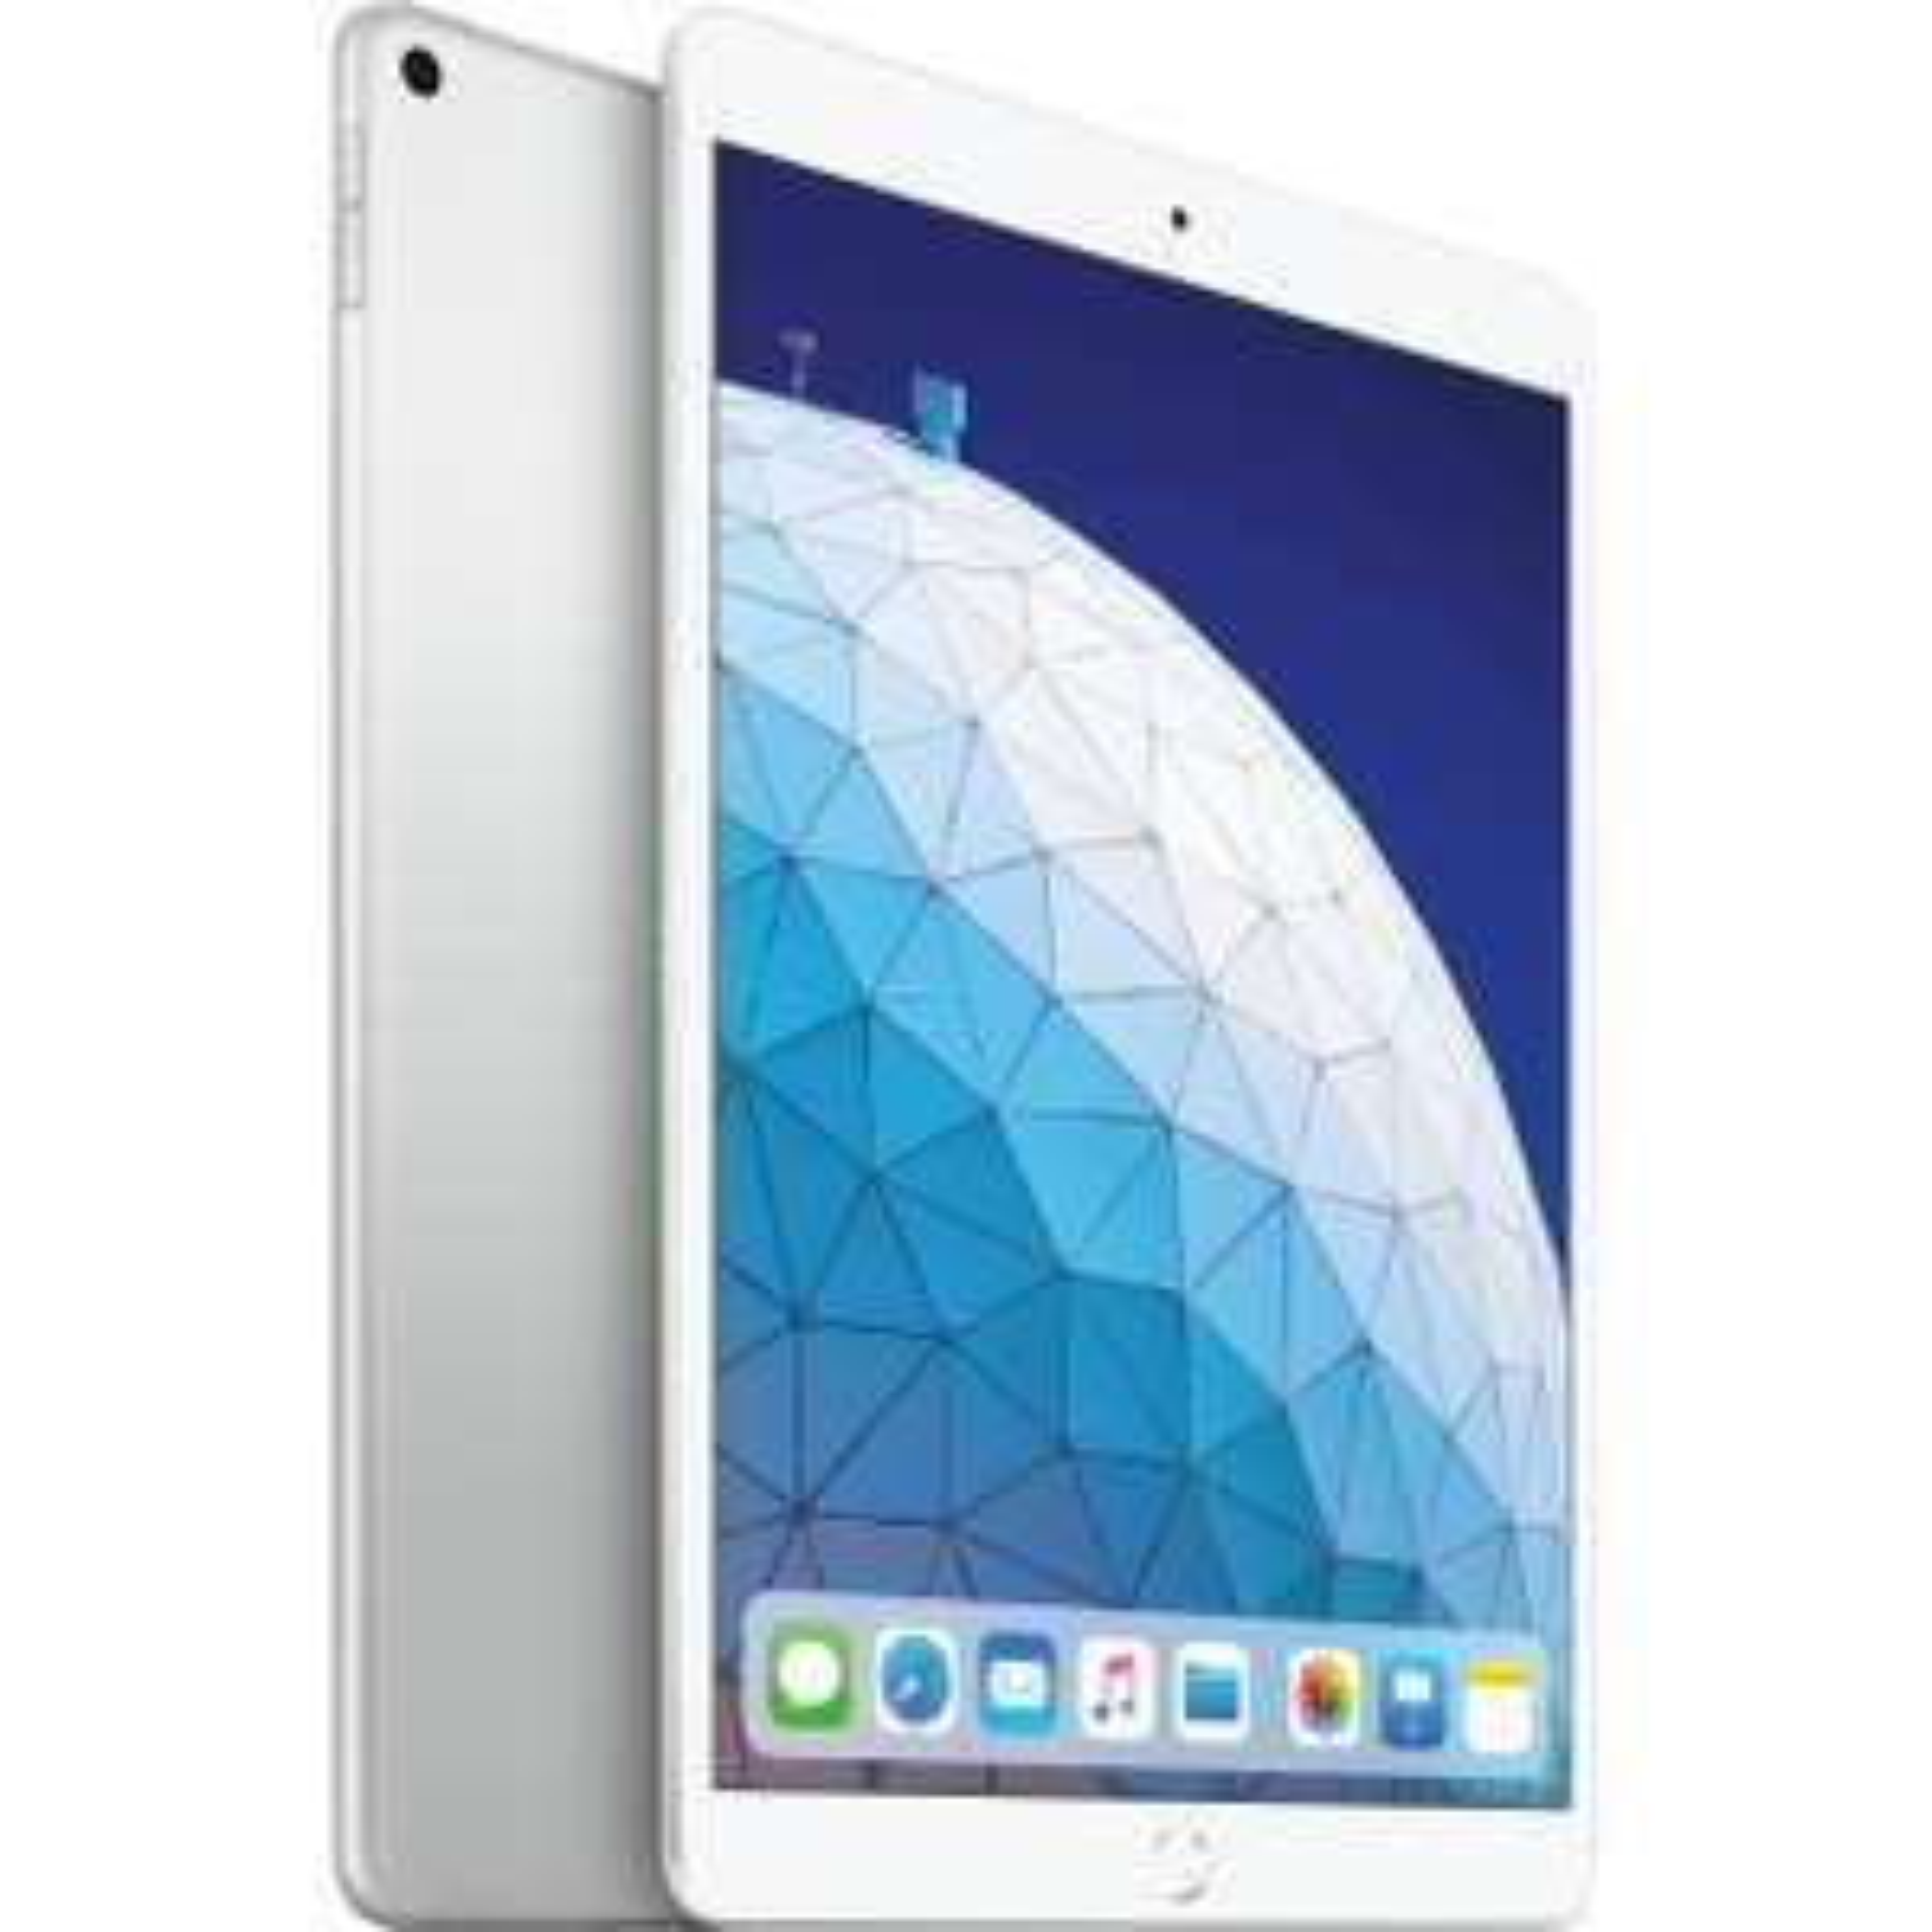 "Sélection de tablettes tactiles Apple iPad en promotion (via bonus de reprise de 70€) - Ex : 10.5"" iPad Air 3 (FHD, A12, 2 Go de RAM, 64 Go)"